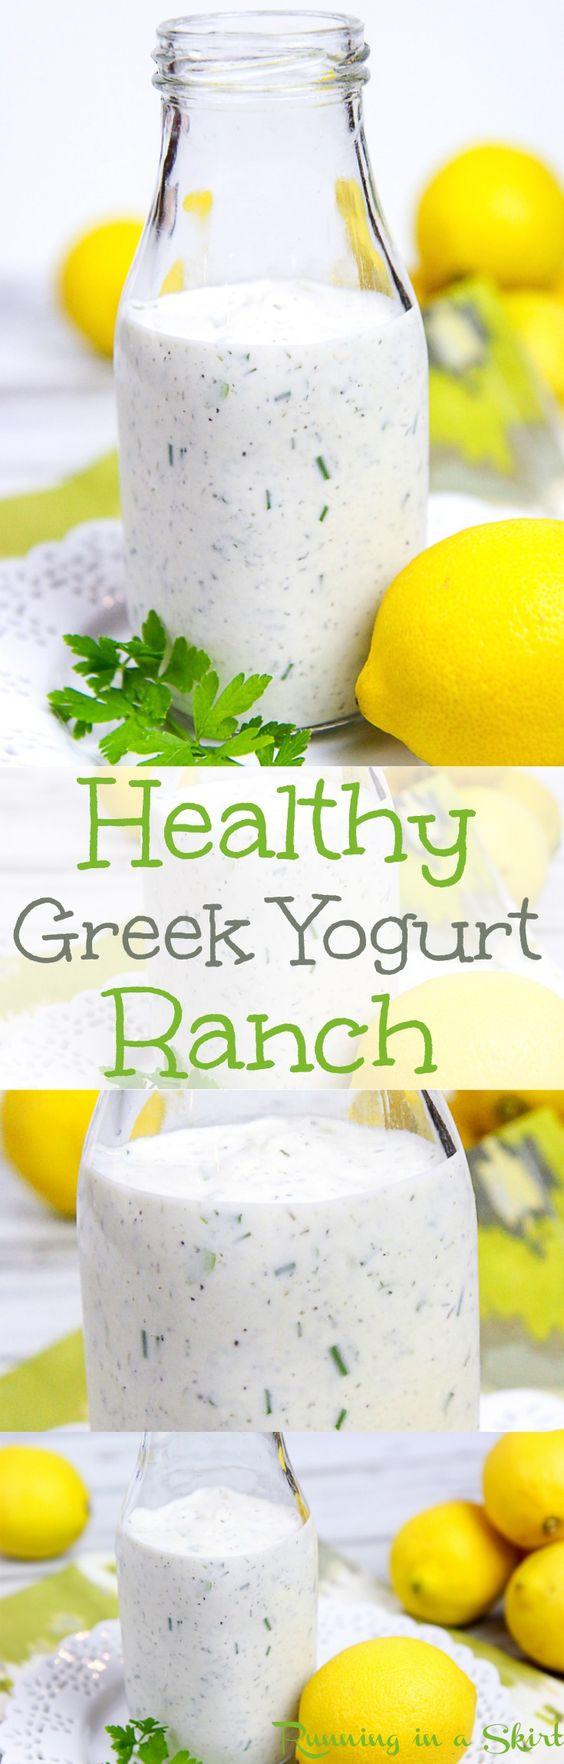 Yogurt ranch dressing, Greek yogurt ranch and Greek yogurt on ...